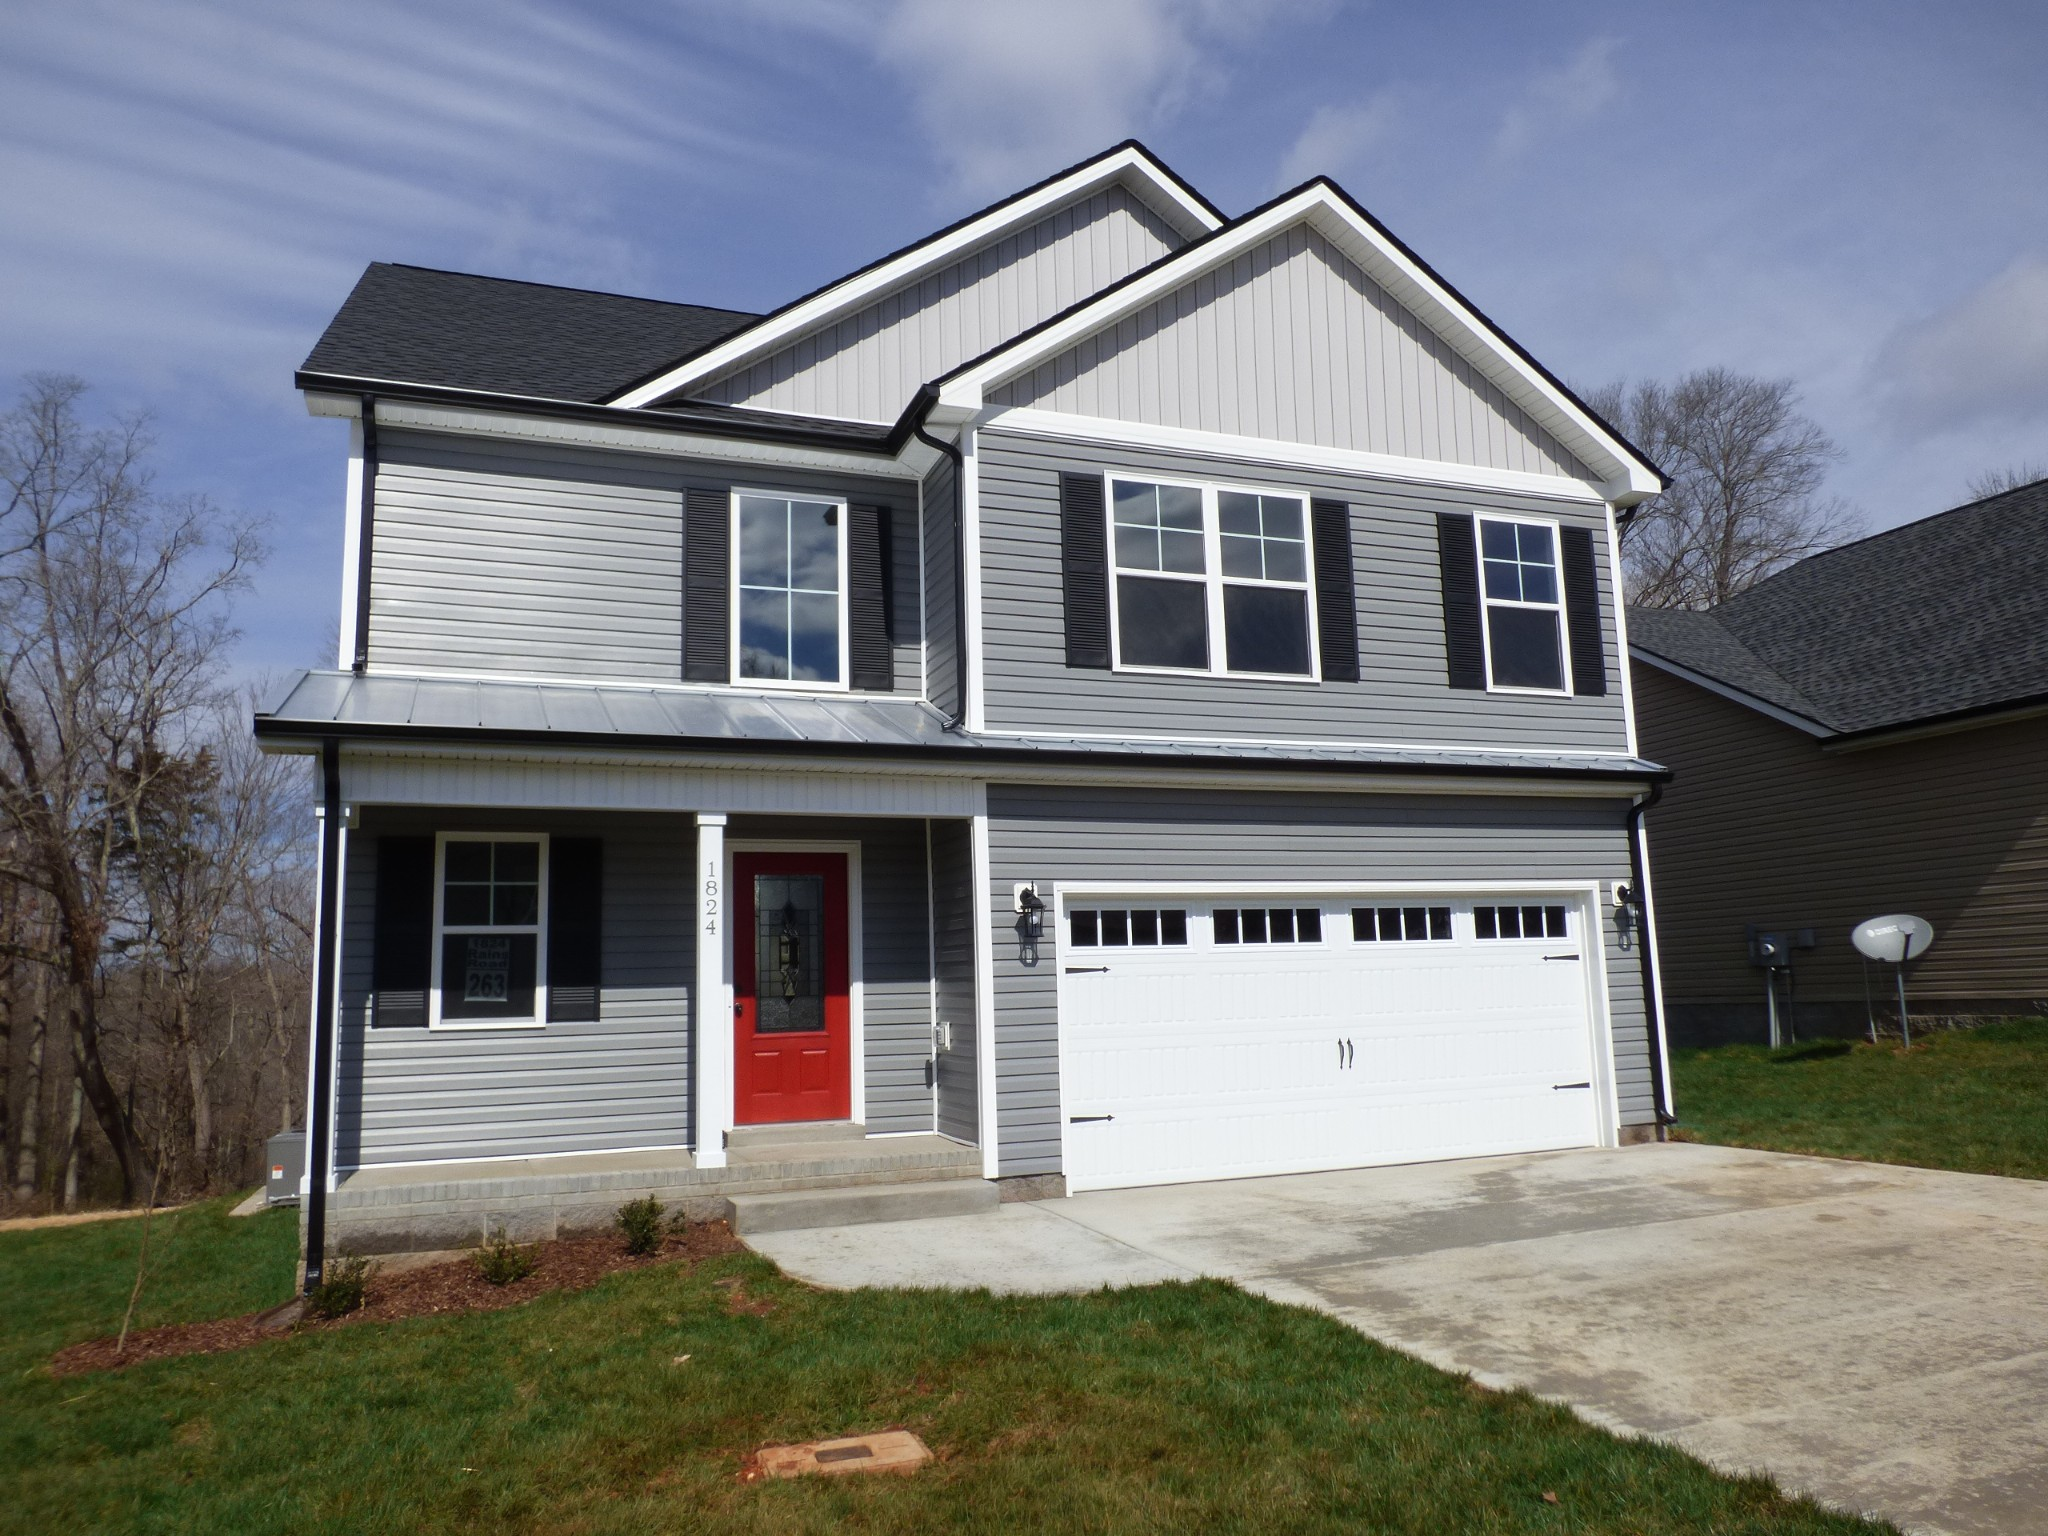 1824 Rains Rd, Clarksville, TN 37042 - Clarksville, TN real estate listing